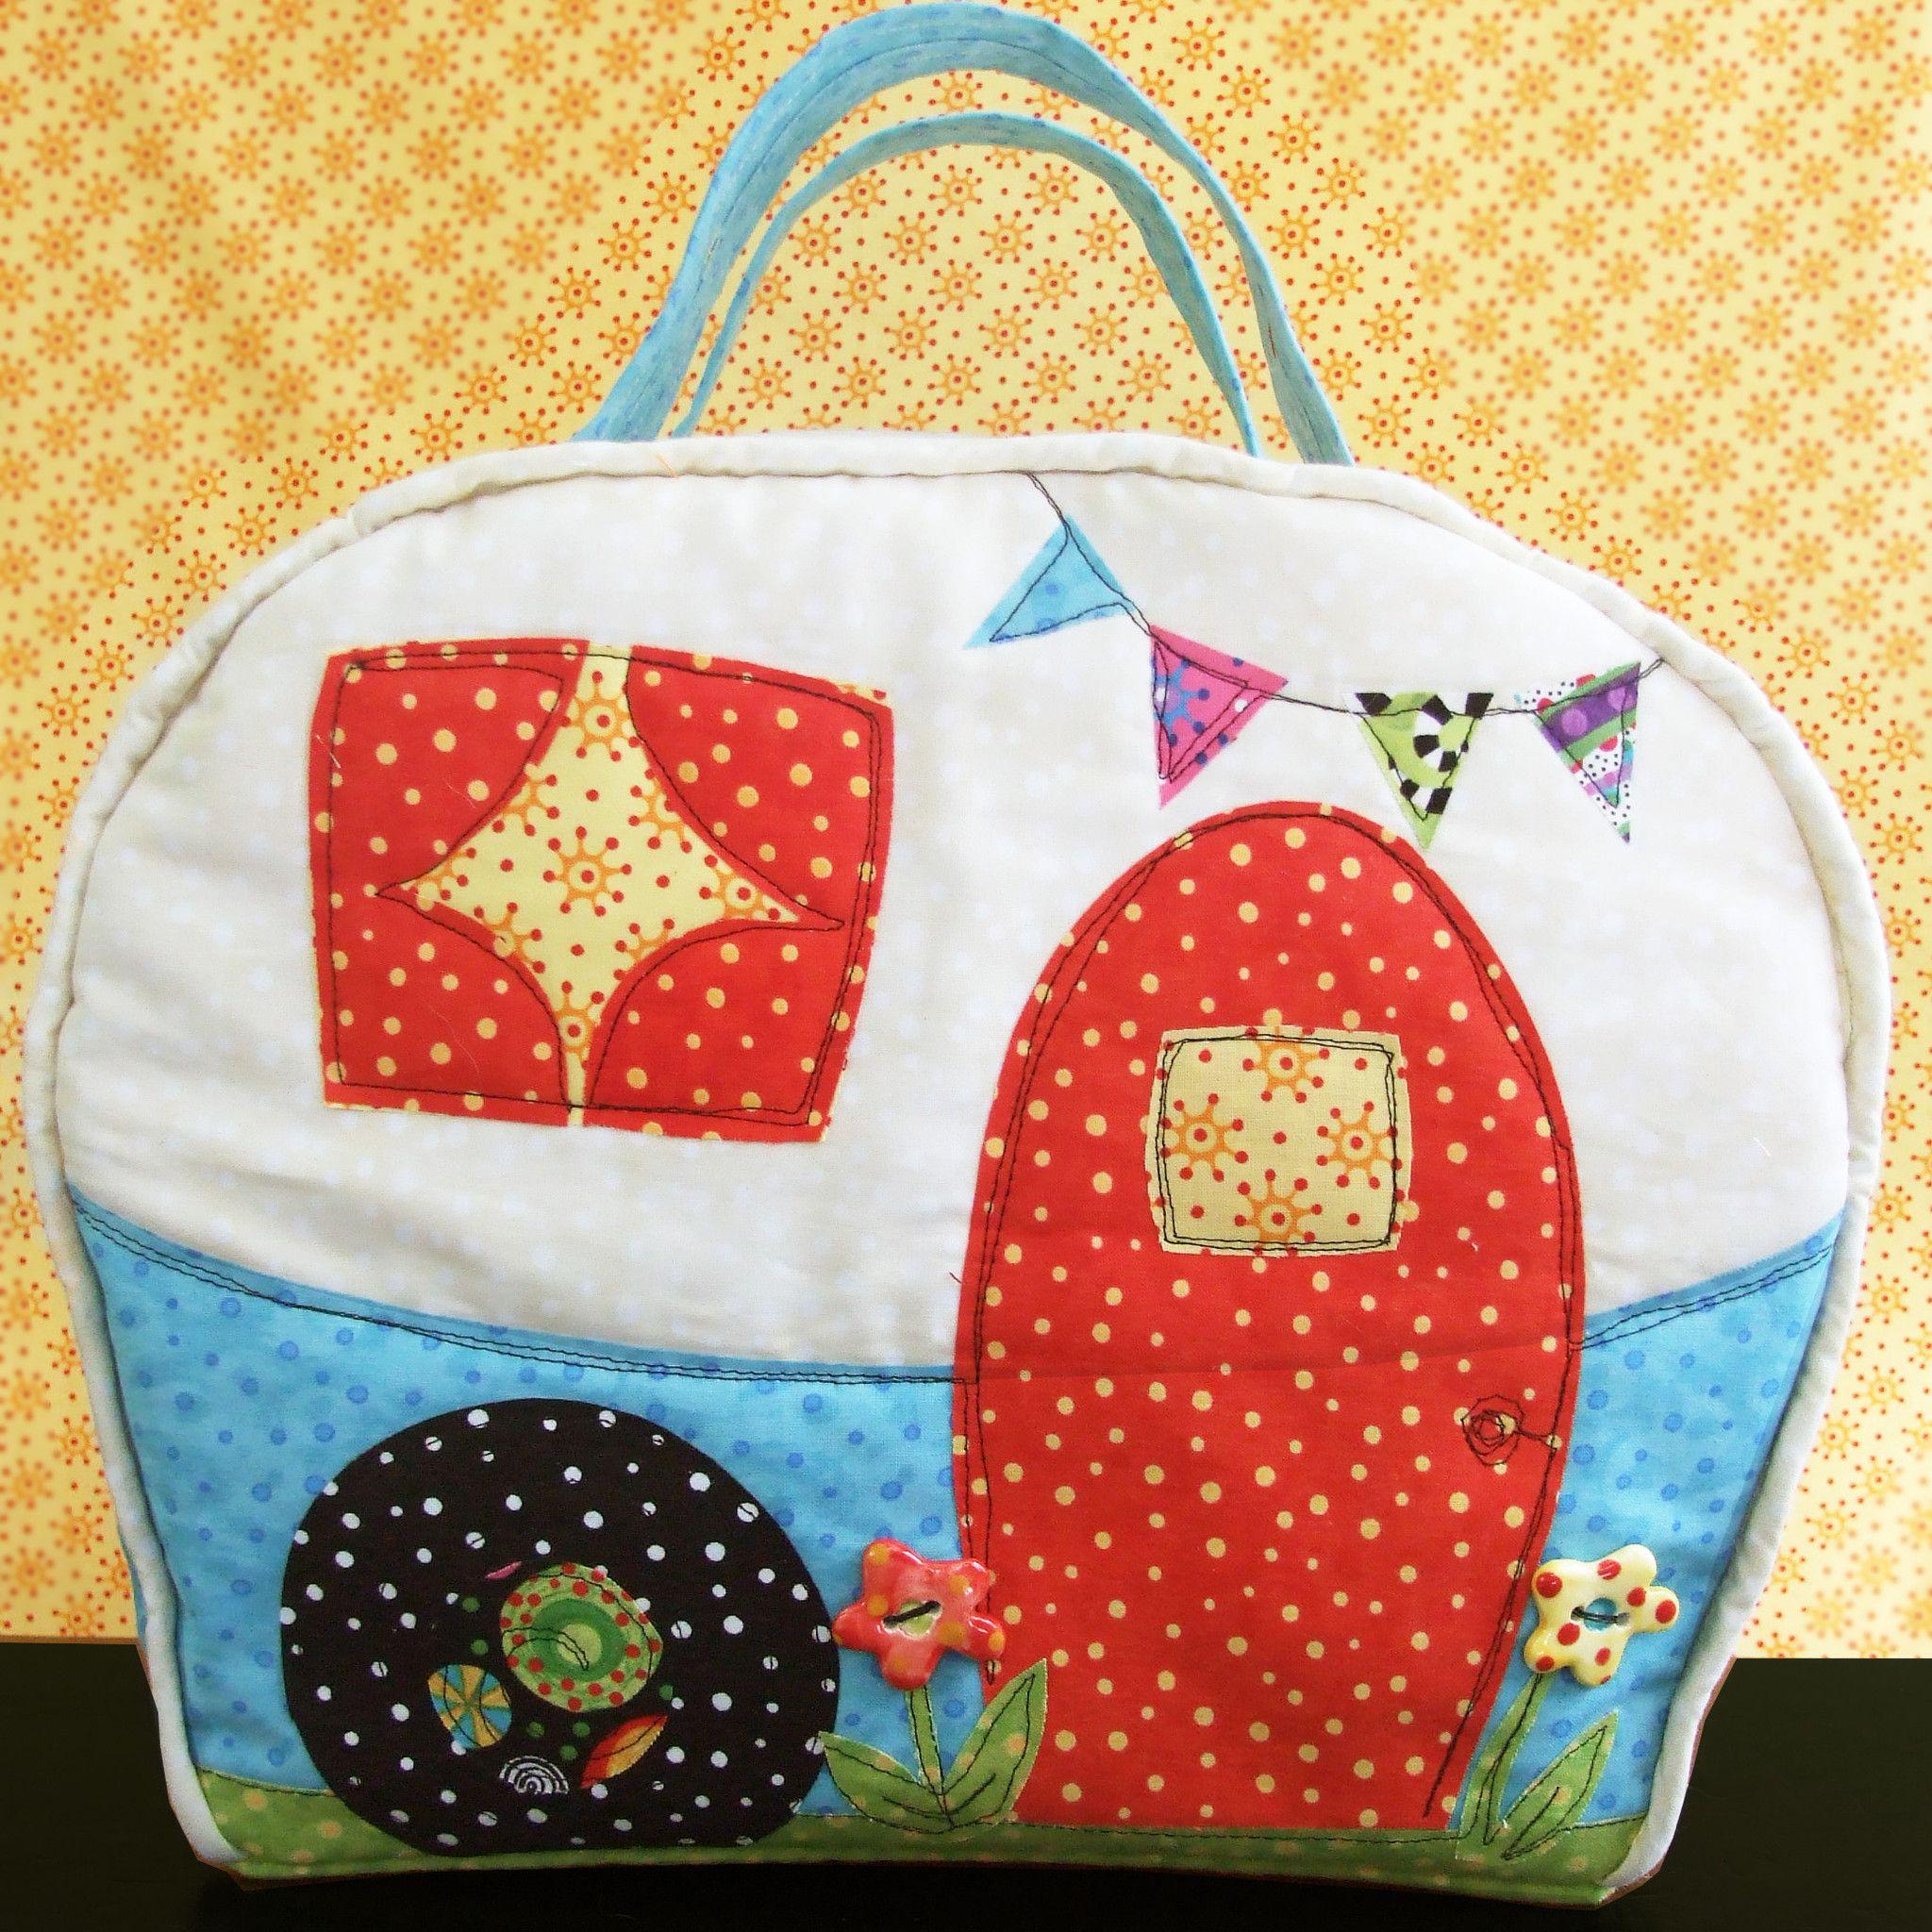 Happy Camper Bag Sewing Pattern | Patchwork